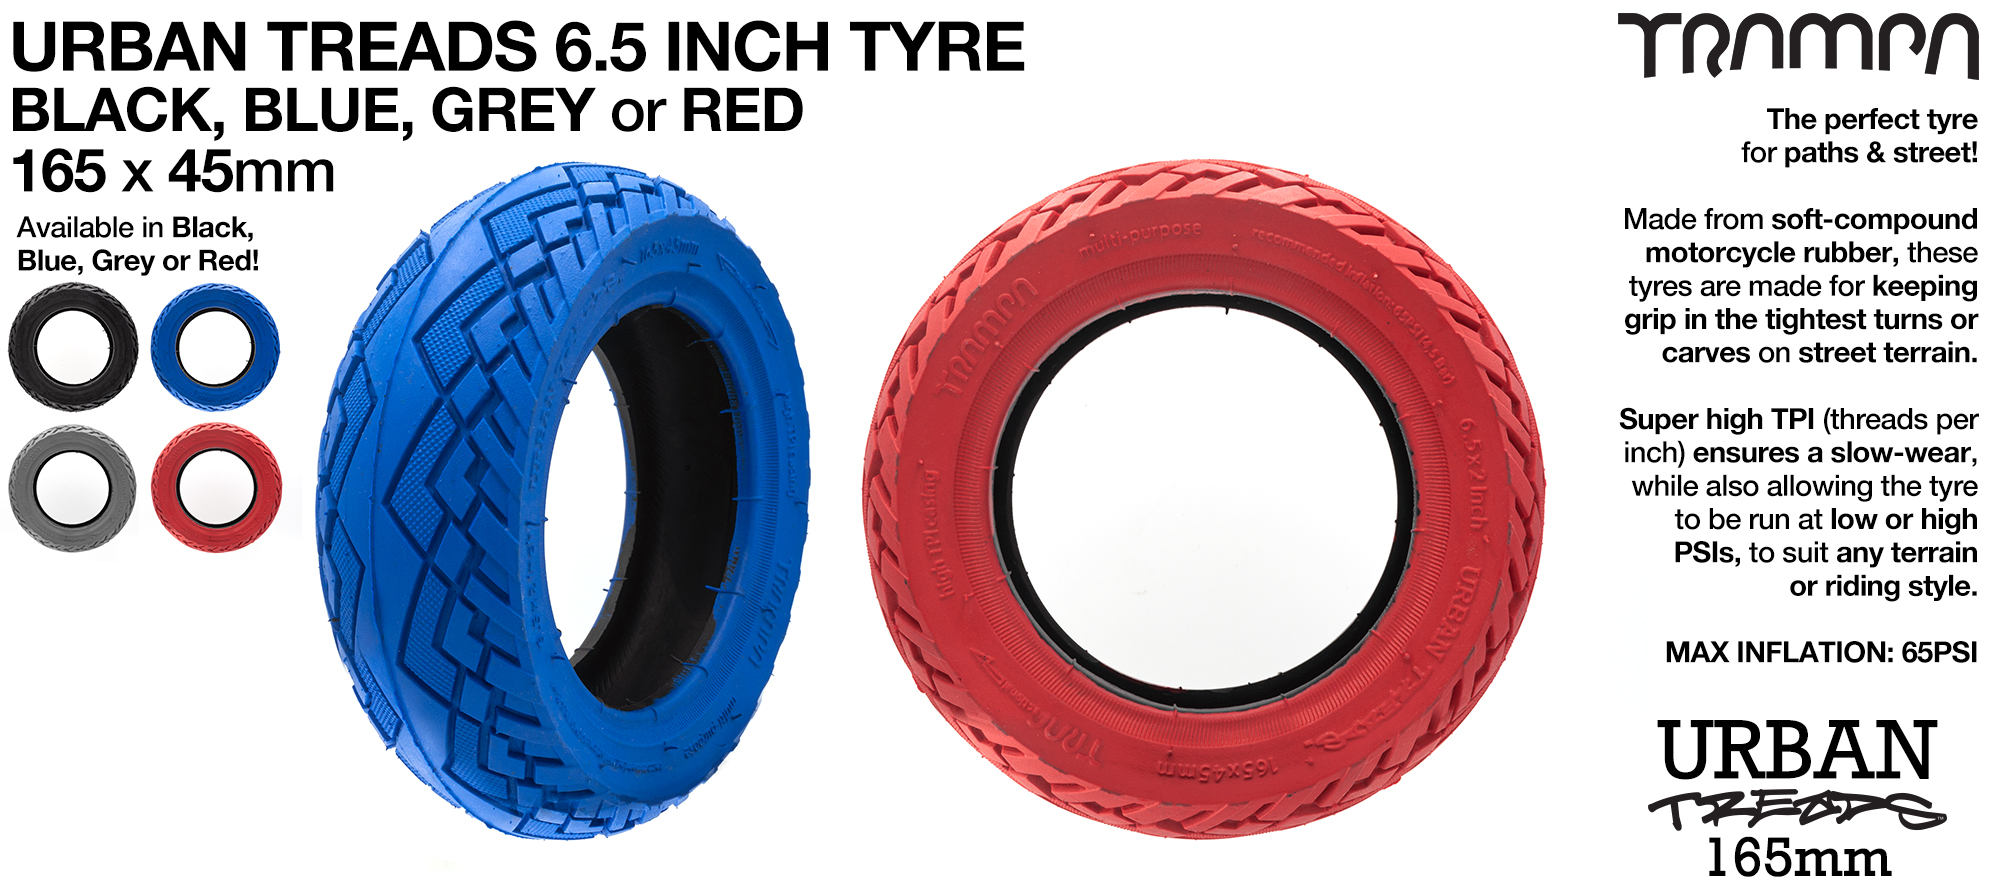 6.5 Inch URBAN Treads High Pressure High speed Tyres